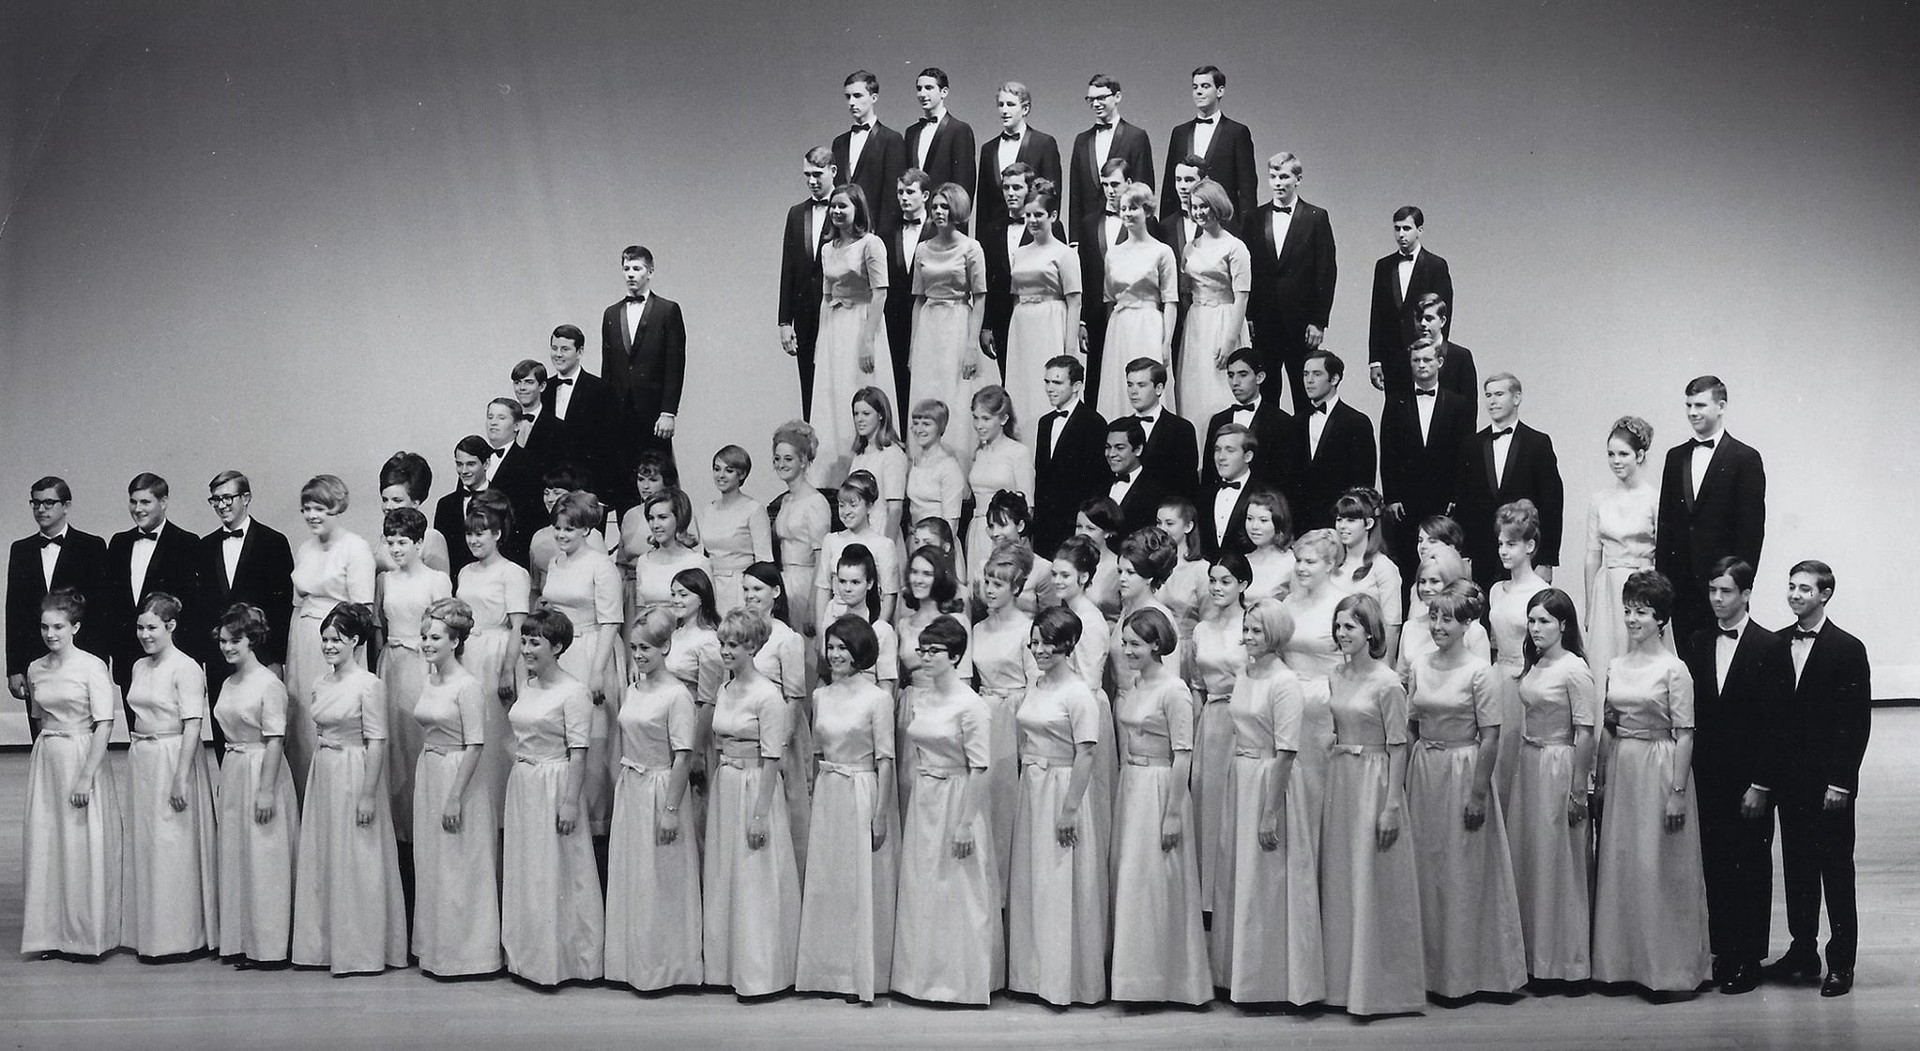 1968 – Germany, Belgium, England, France, Switzerland, Italy, Austria